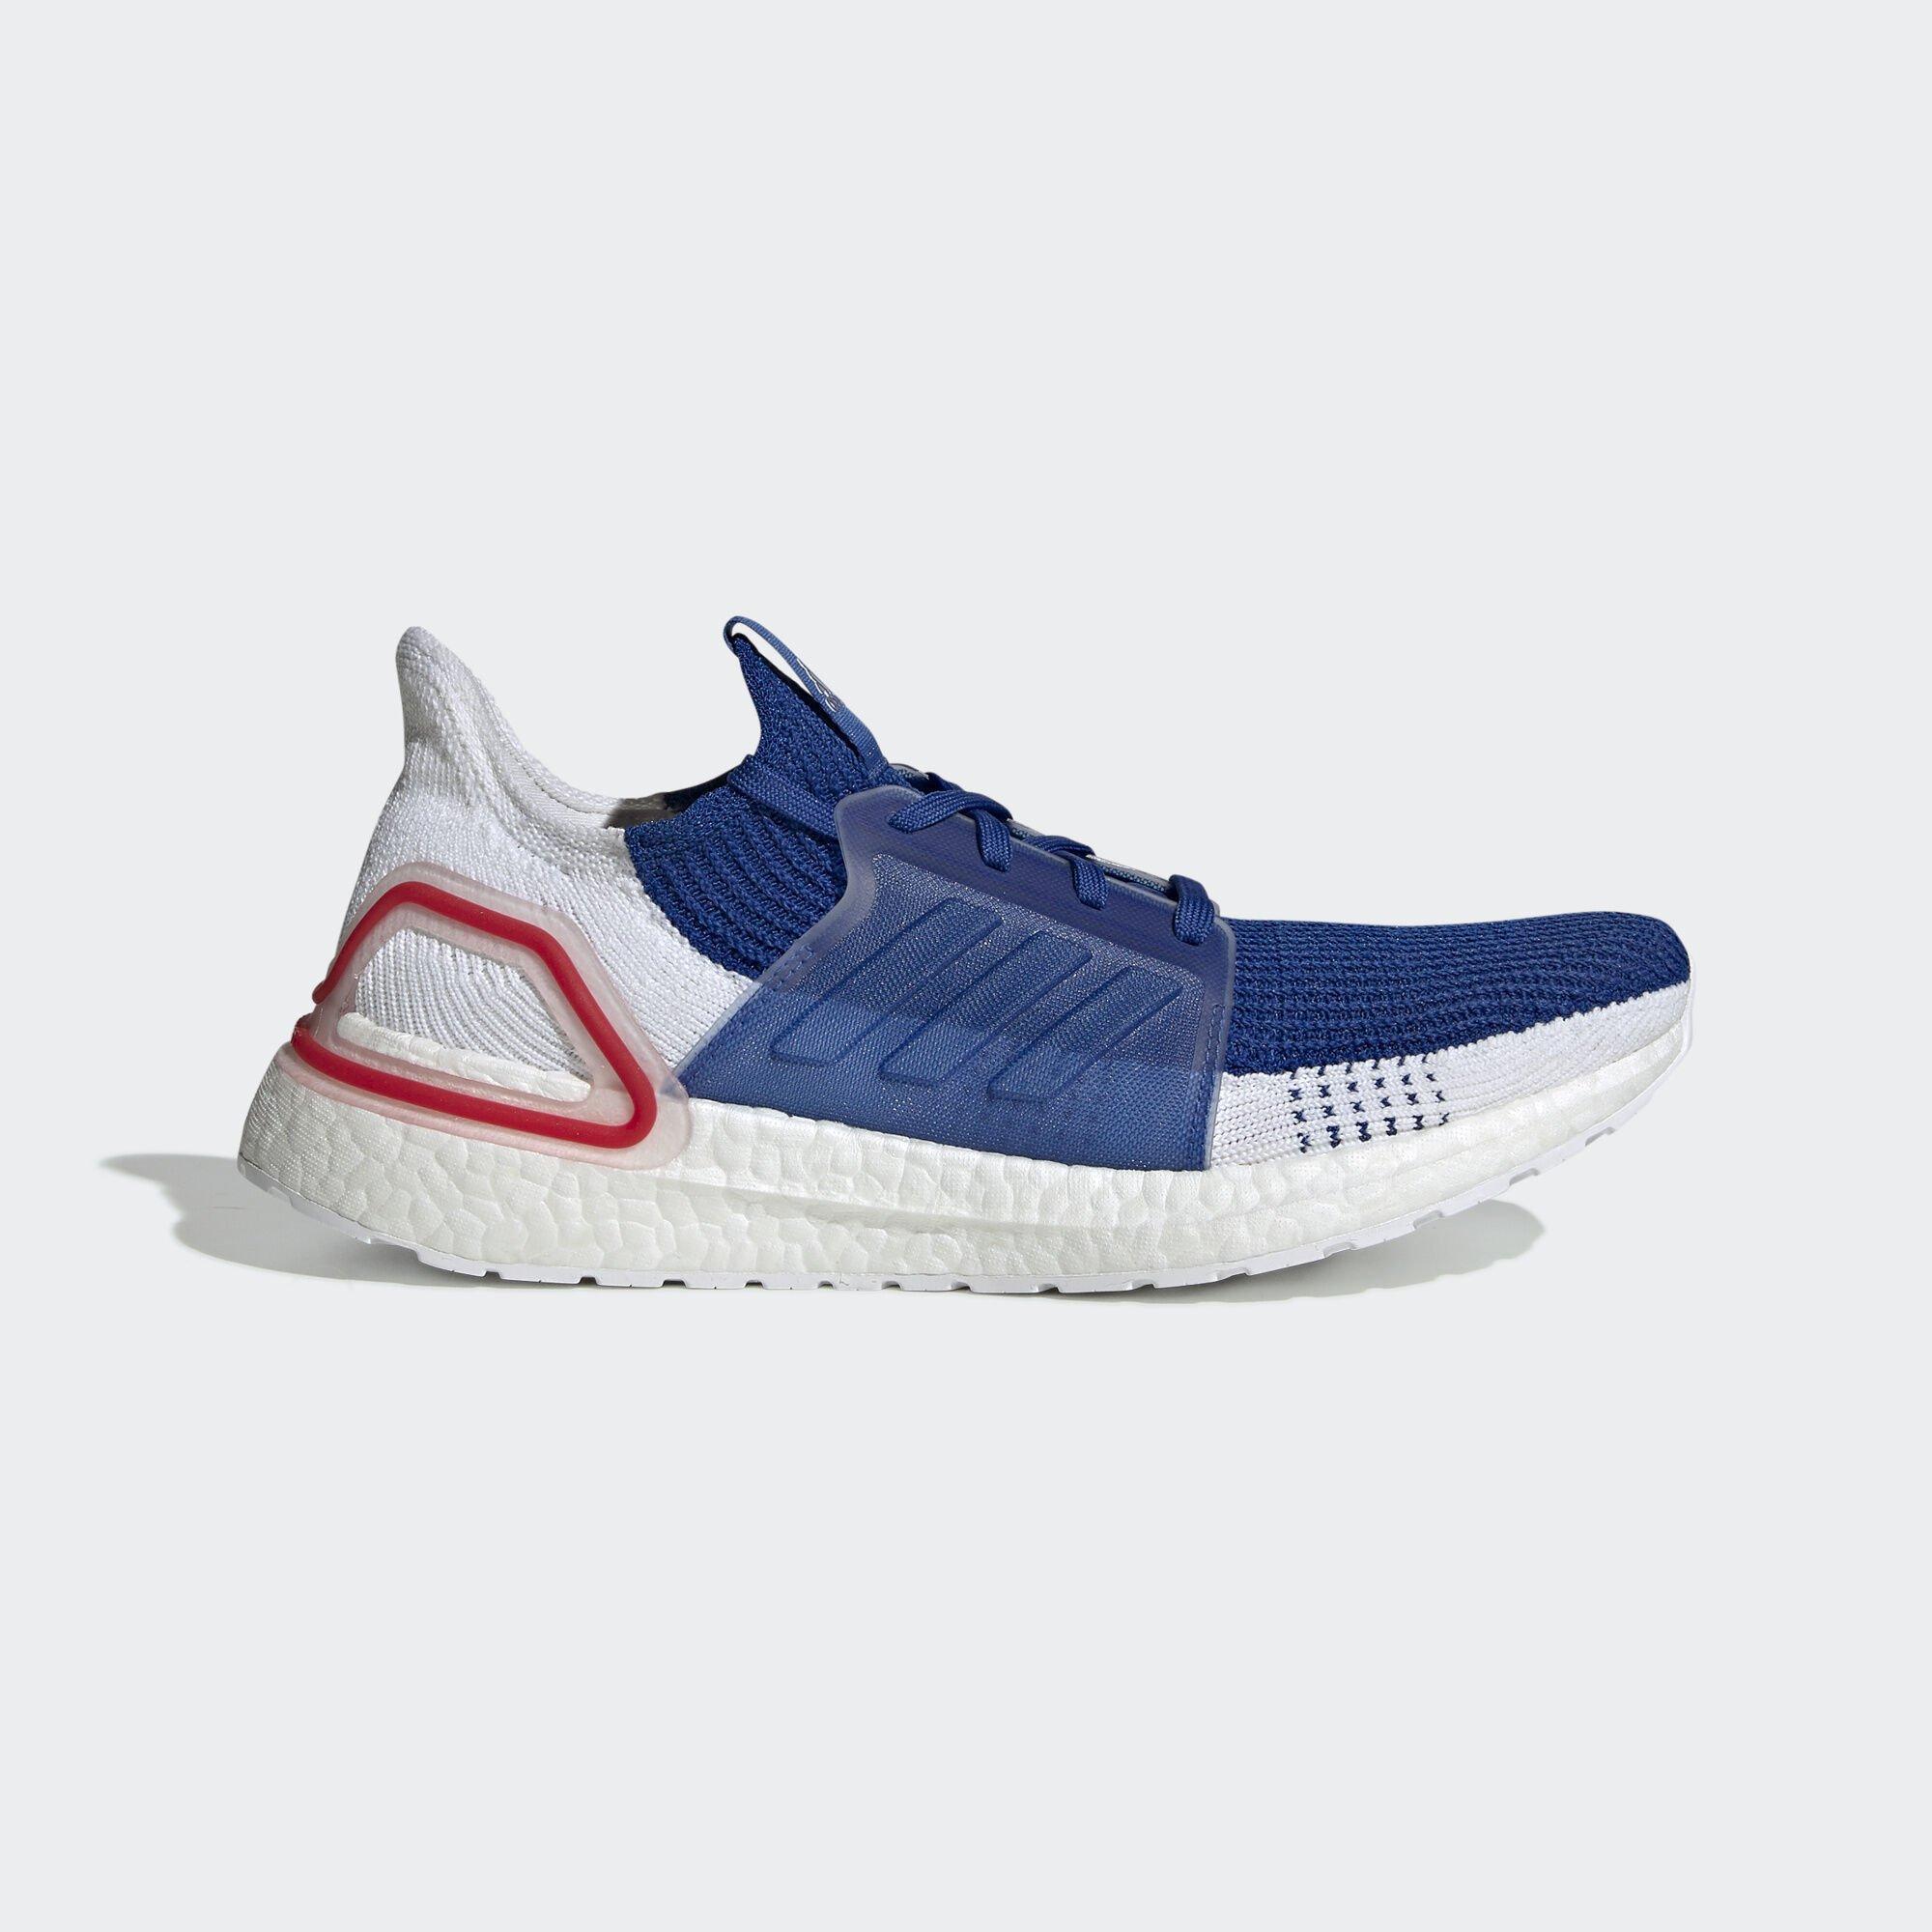 adidas Ultra Boost 19 White Blue (EF1340)